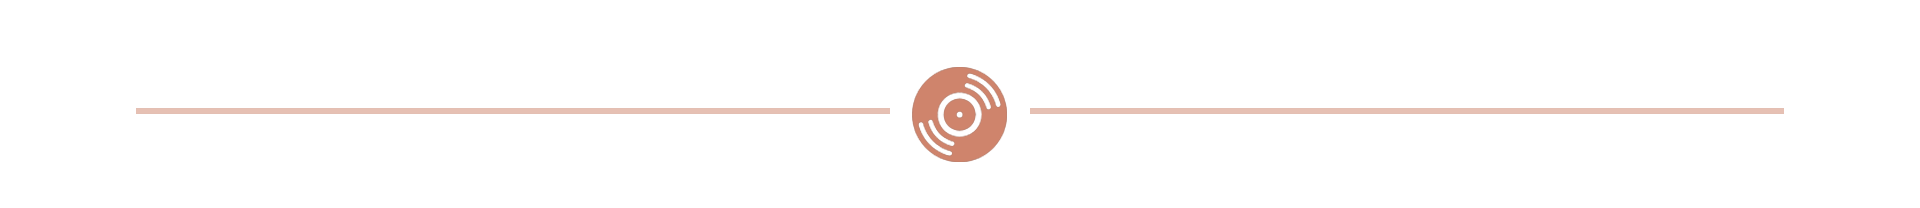 discografia-barra-espacio